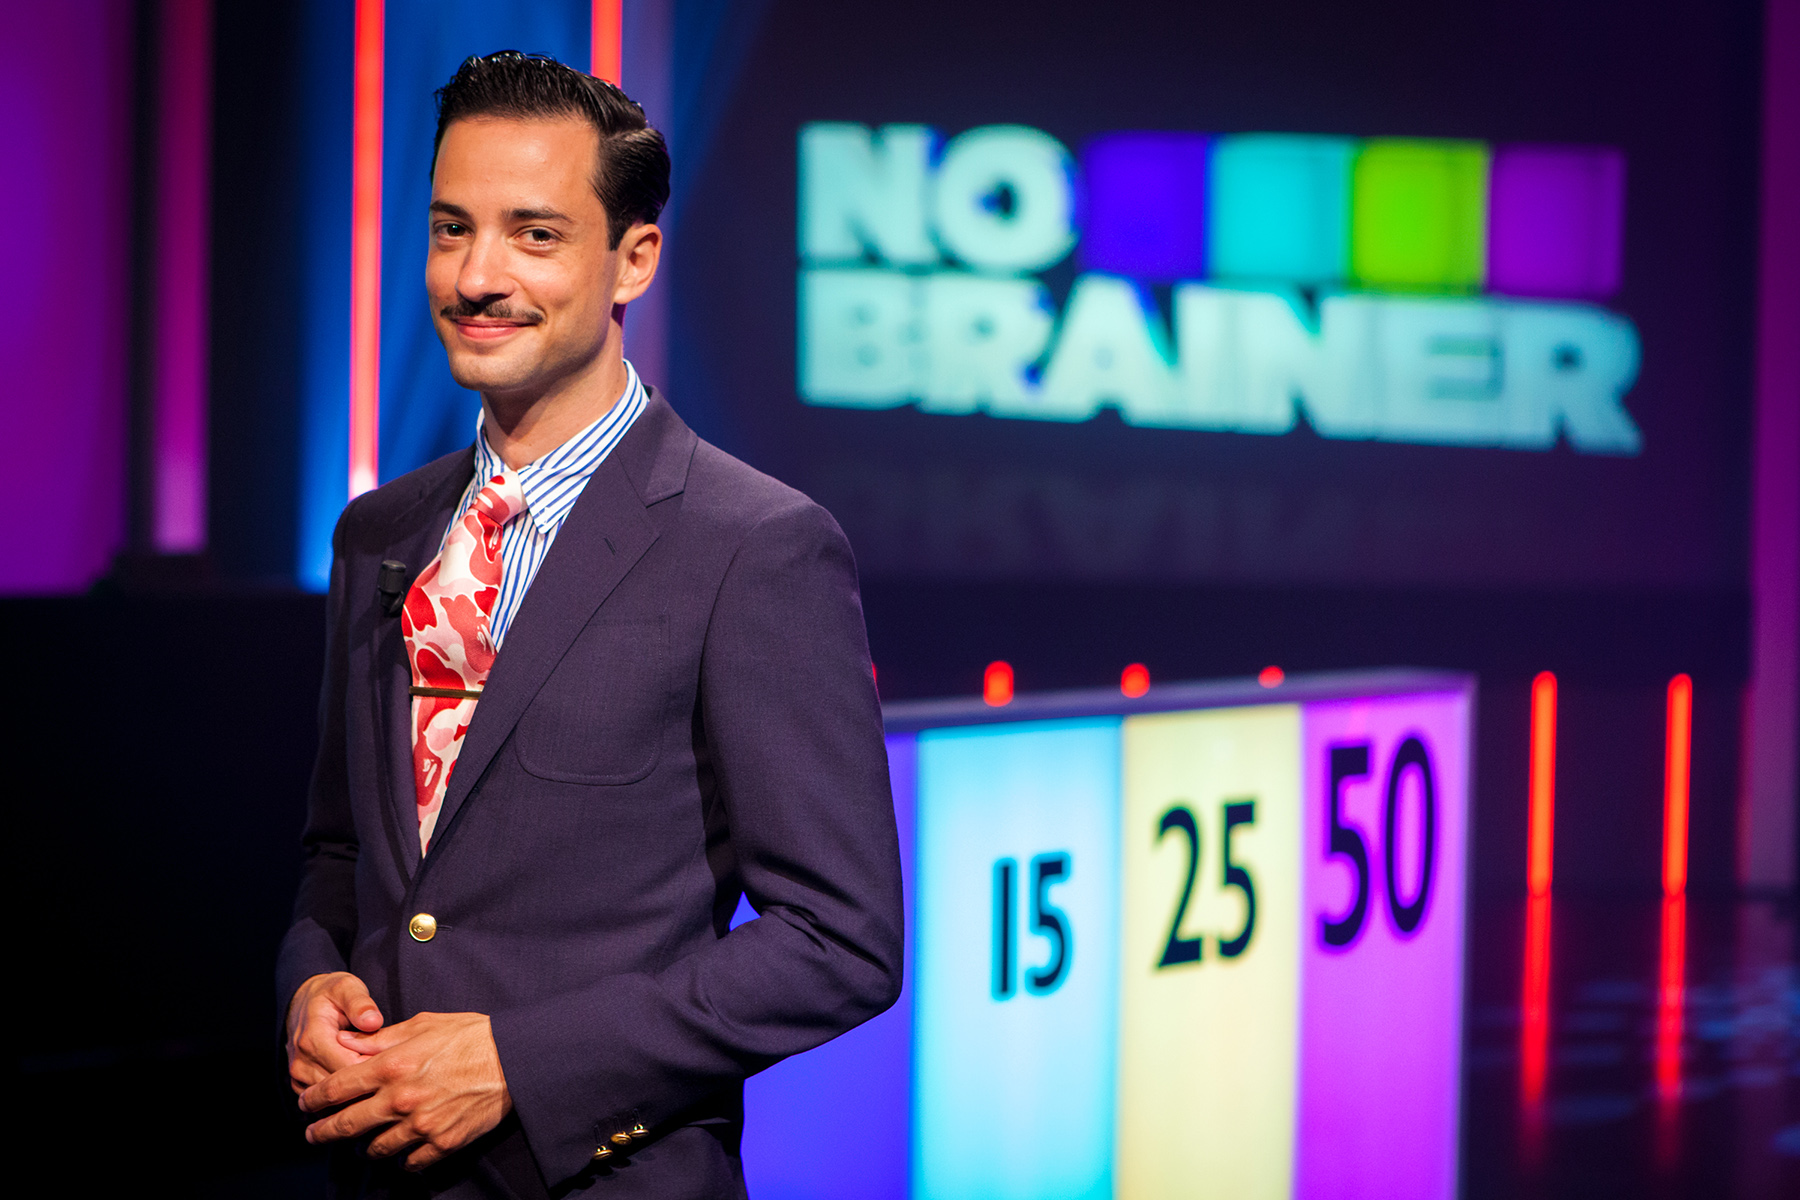 No Brainer - The Netherlands